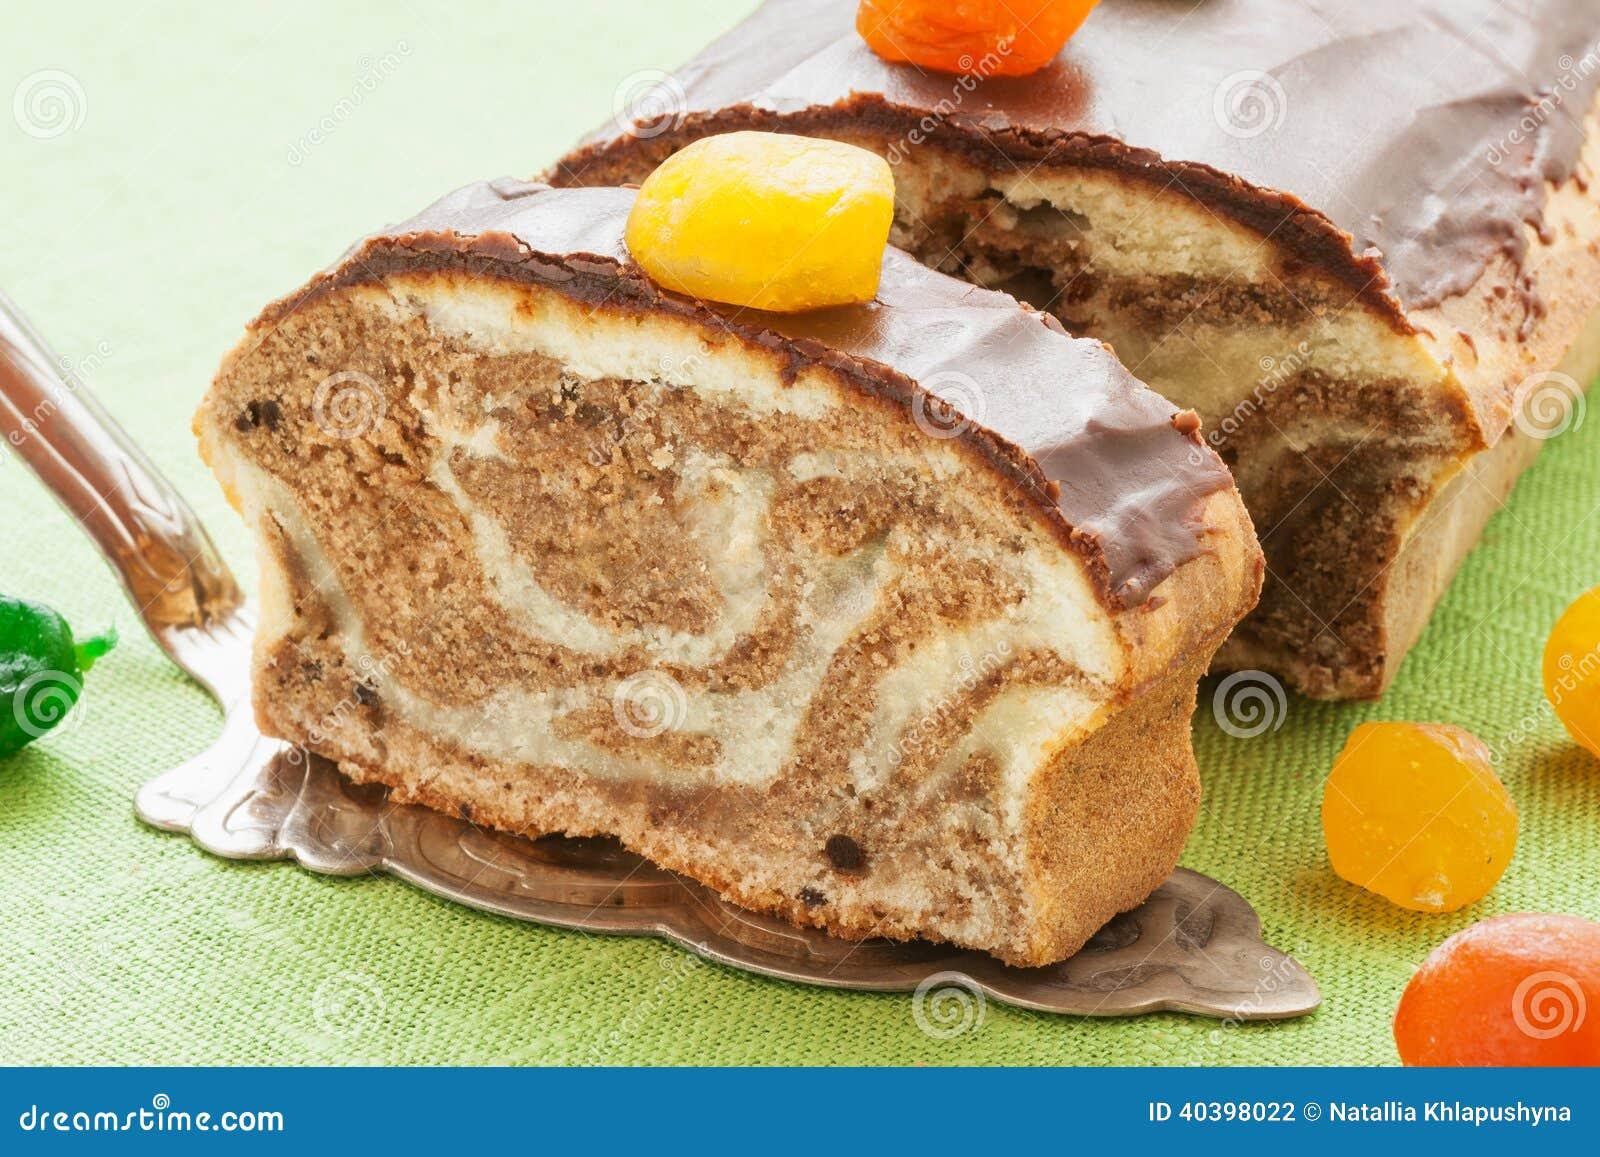 ... pound cake marble pound cake marble pound cake marble loaf pound cake